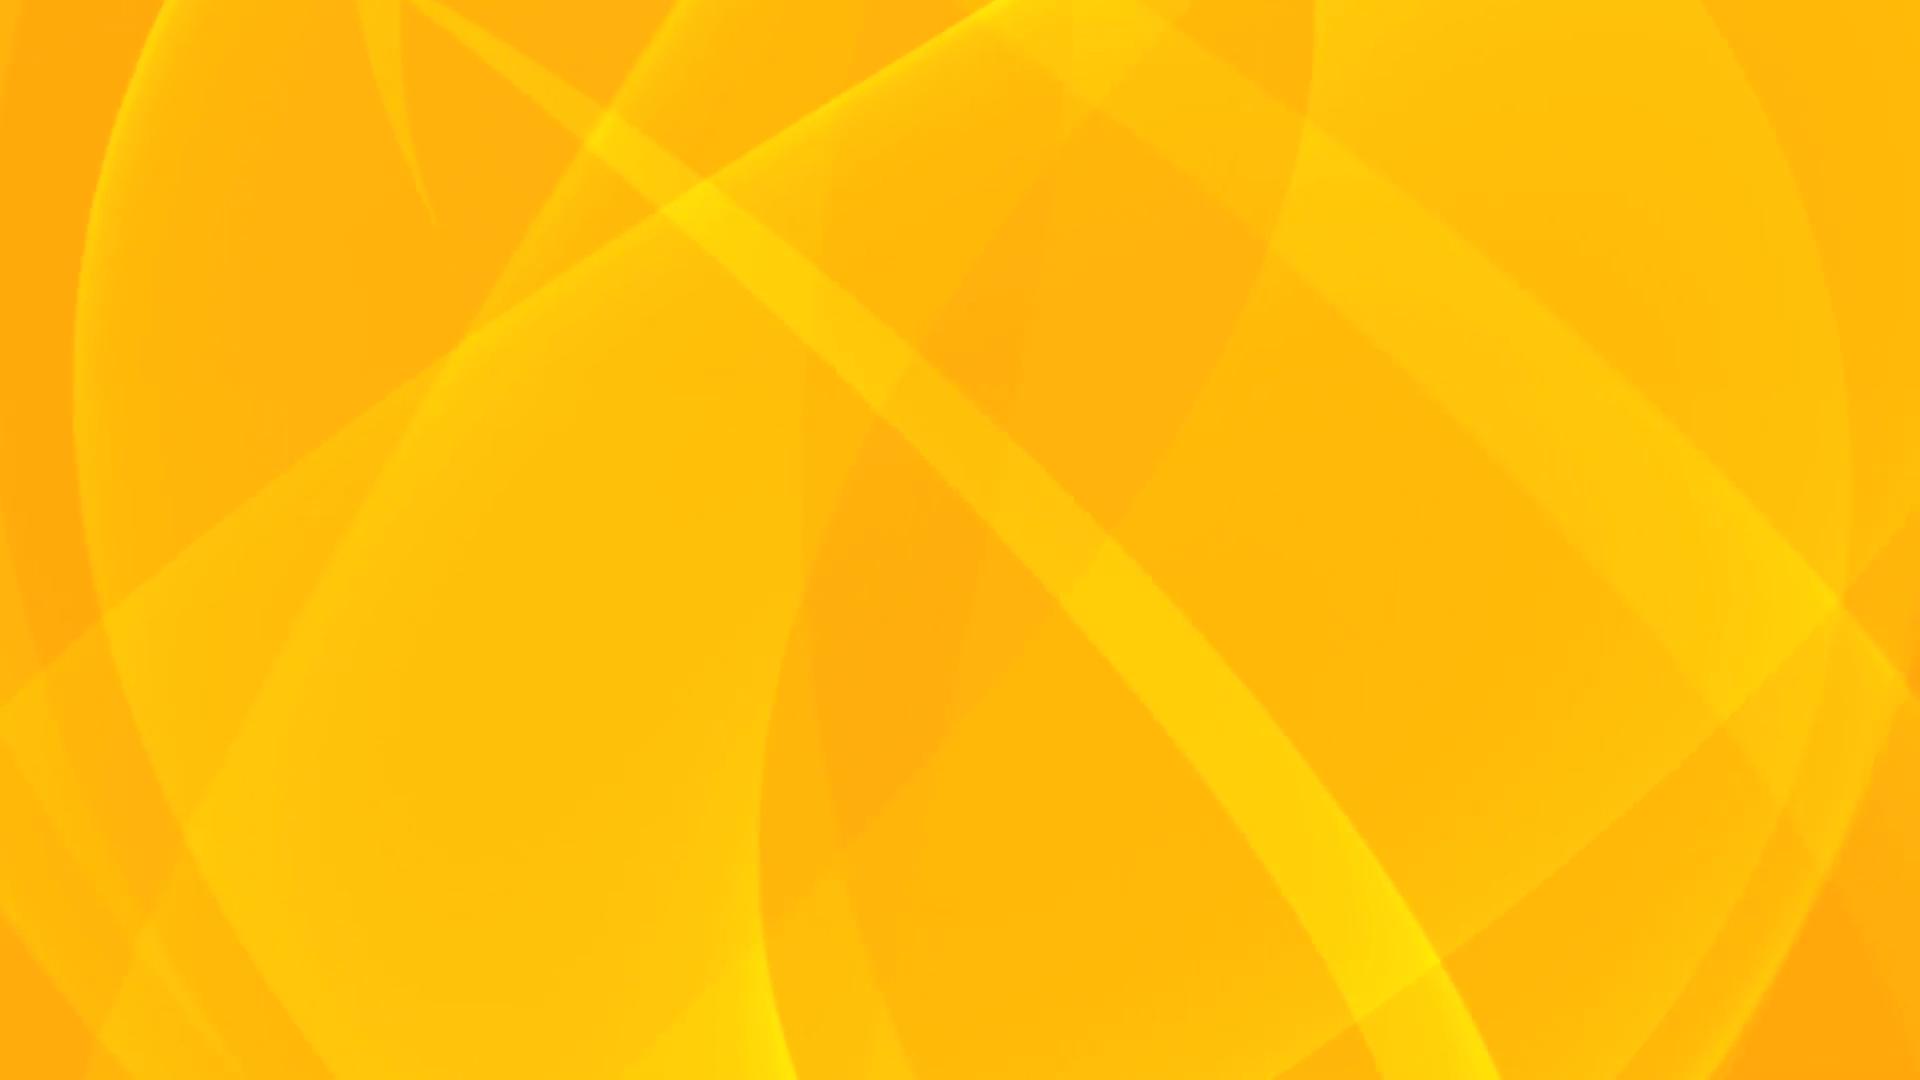 [18+] A Orange Background on WallpaperSafari